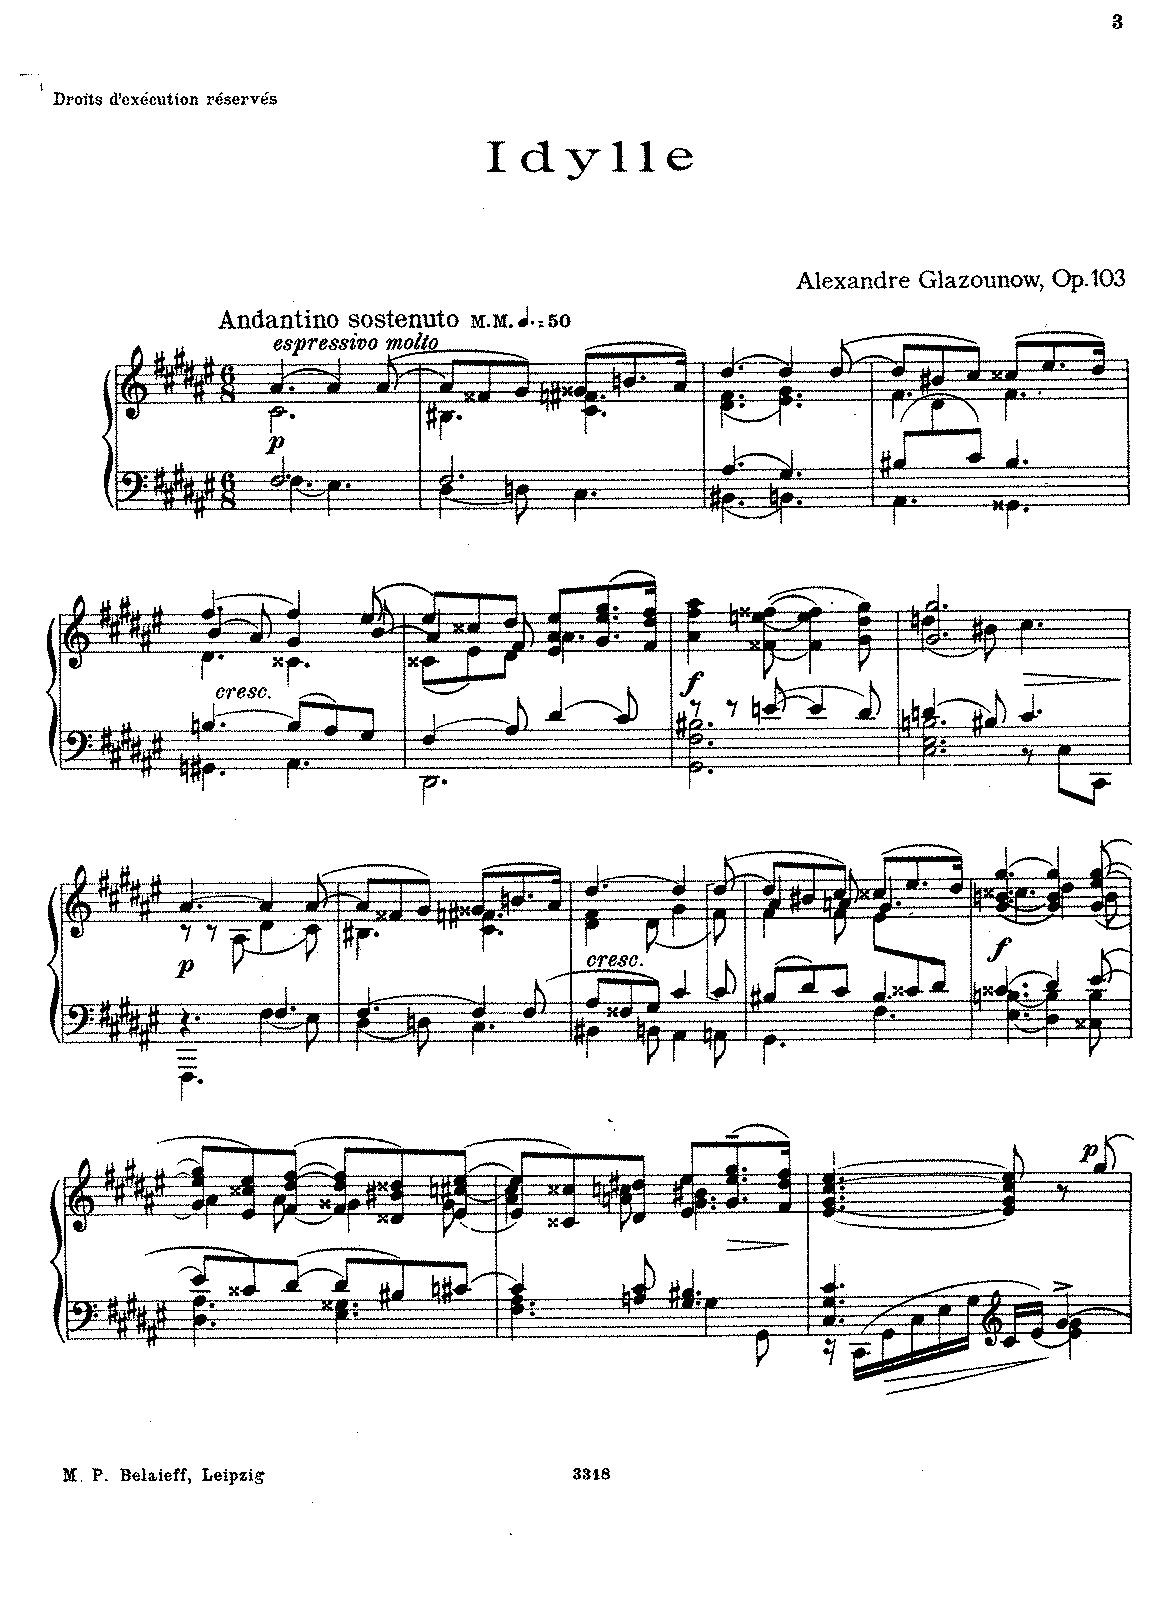 Idylle op103 glazunov aleksandr imslppetrucci music complete score hexwebz Gallery